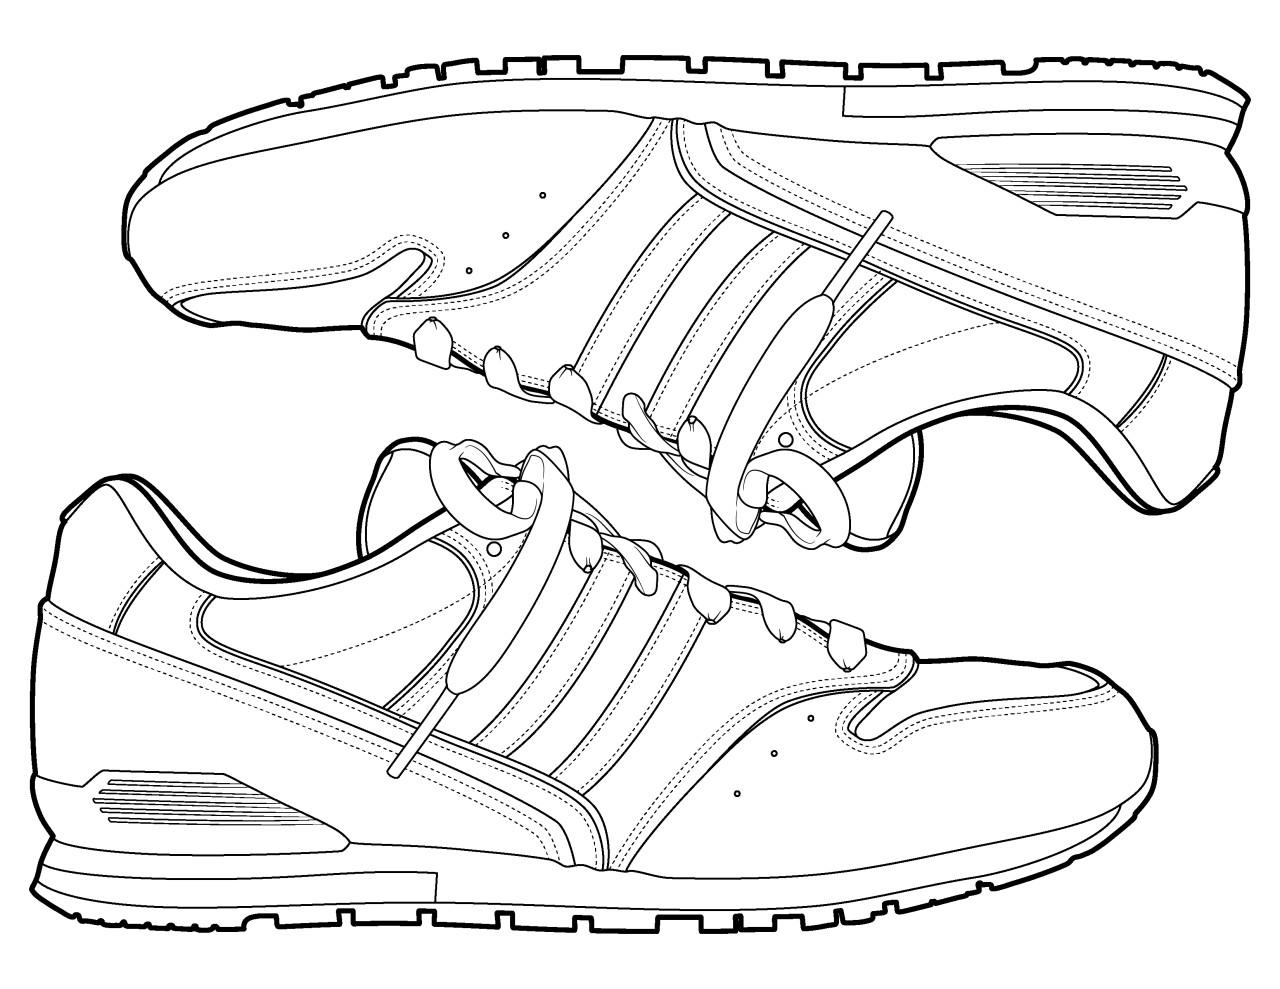 Sneaker Coloring Book  The Spinsterhood Diaries Sneakers Coloring Page